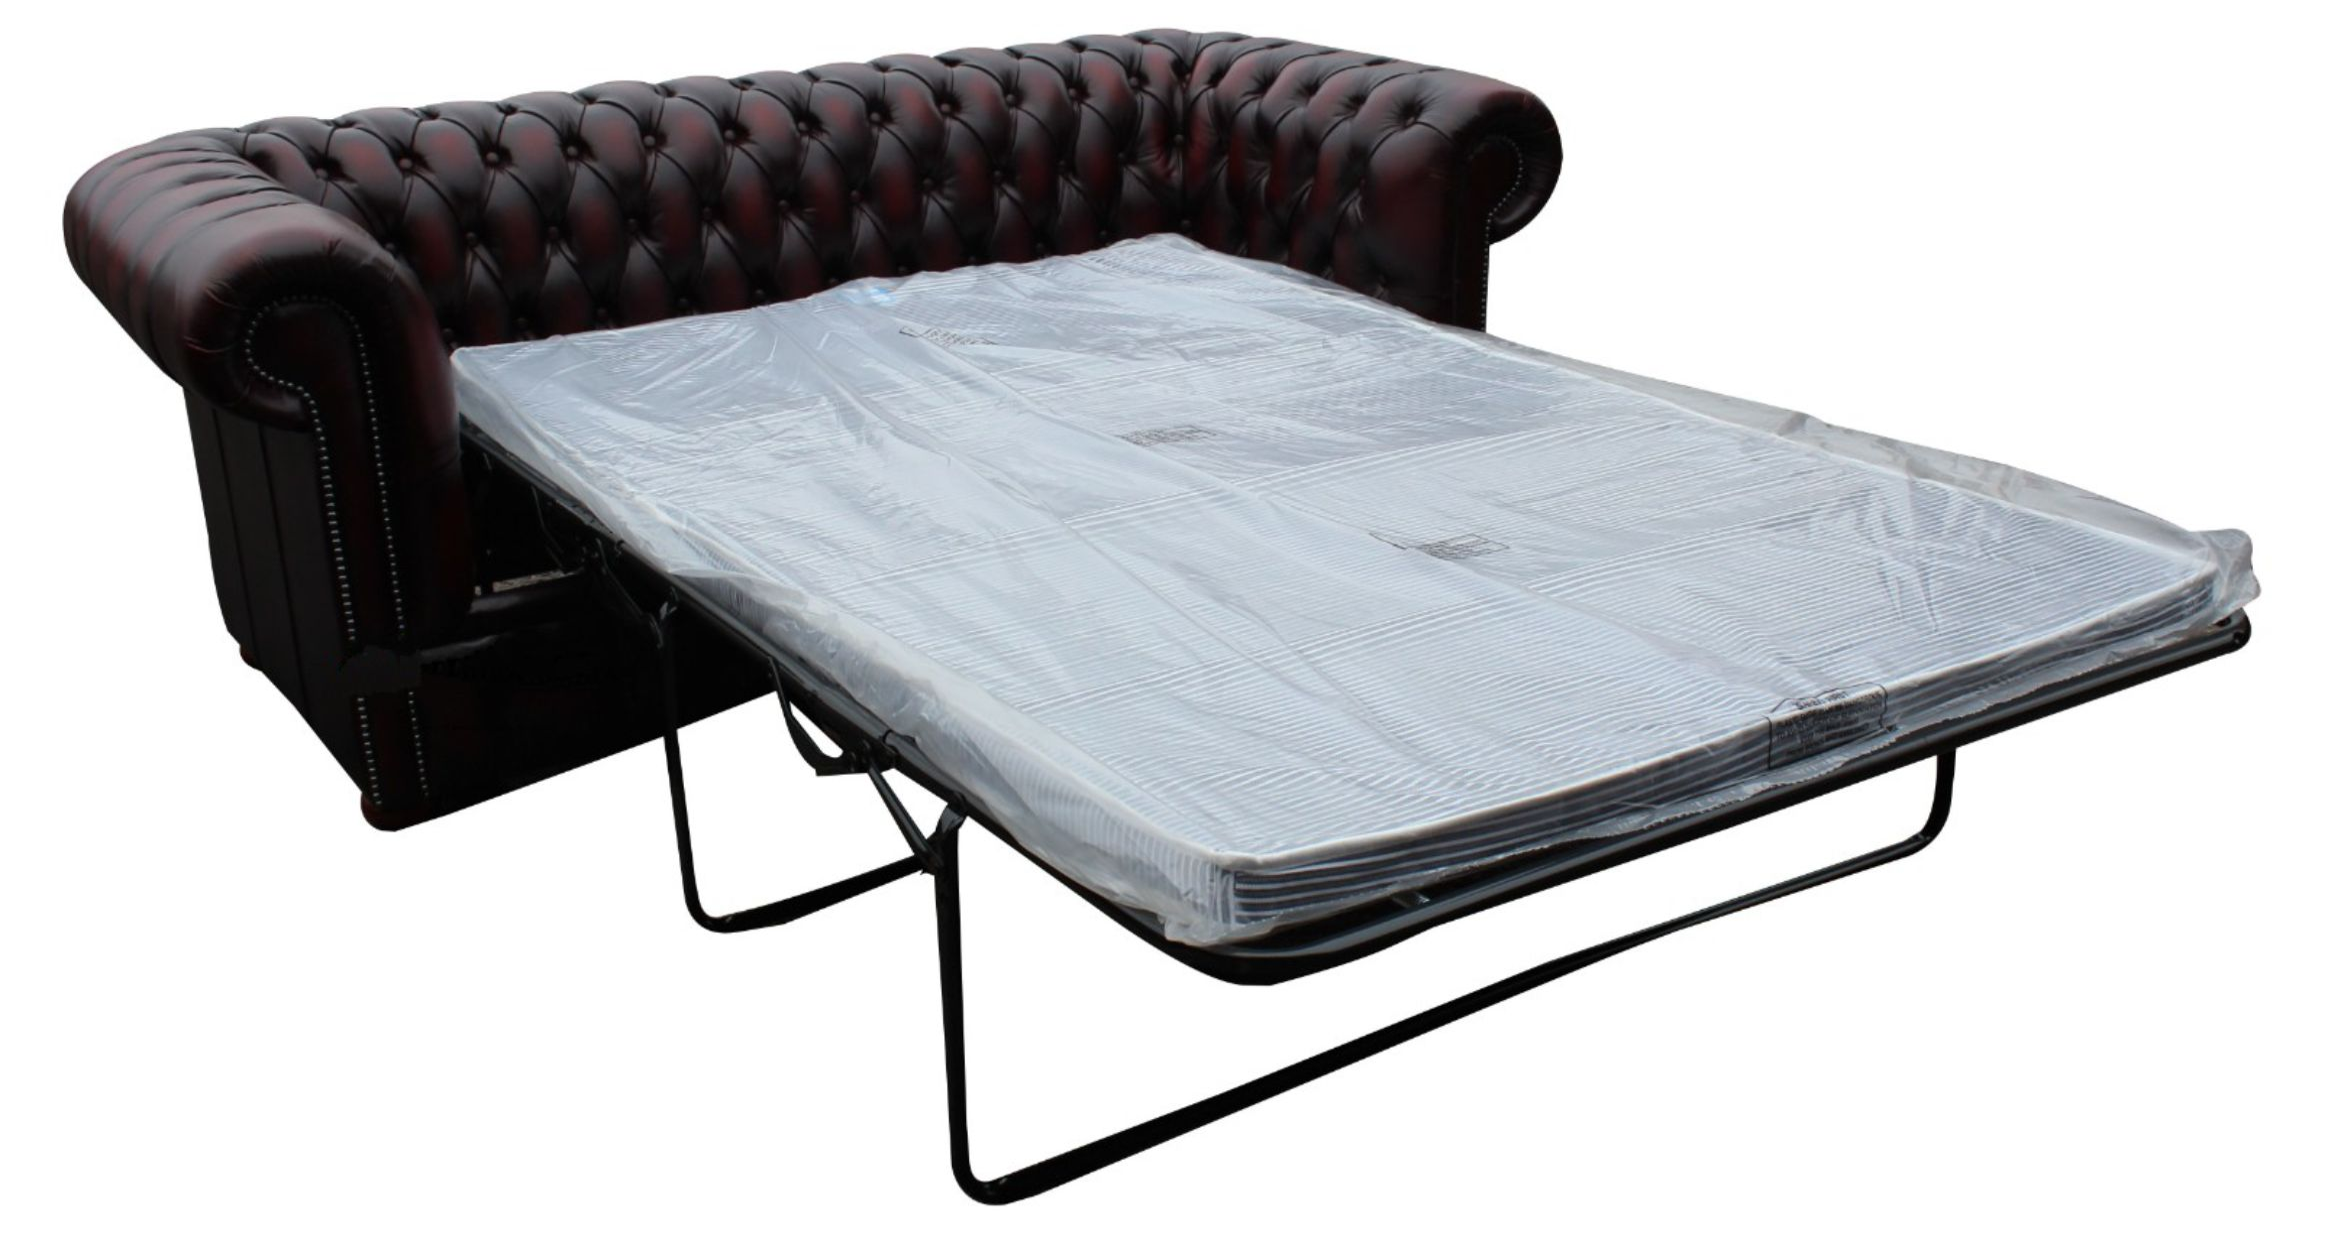 Buy Antique Oxblood Chesterfield Sofa Bed Designersofas4u